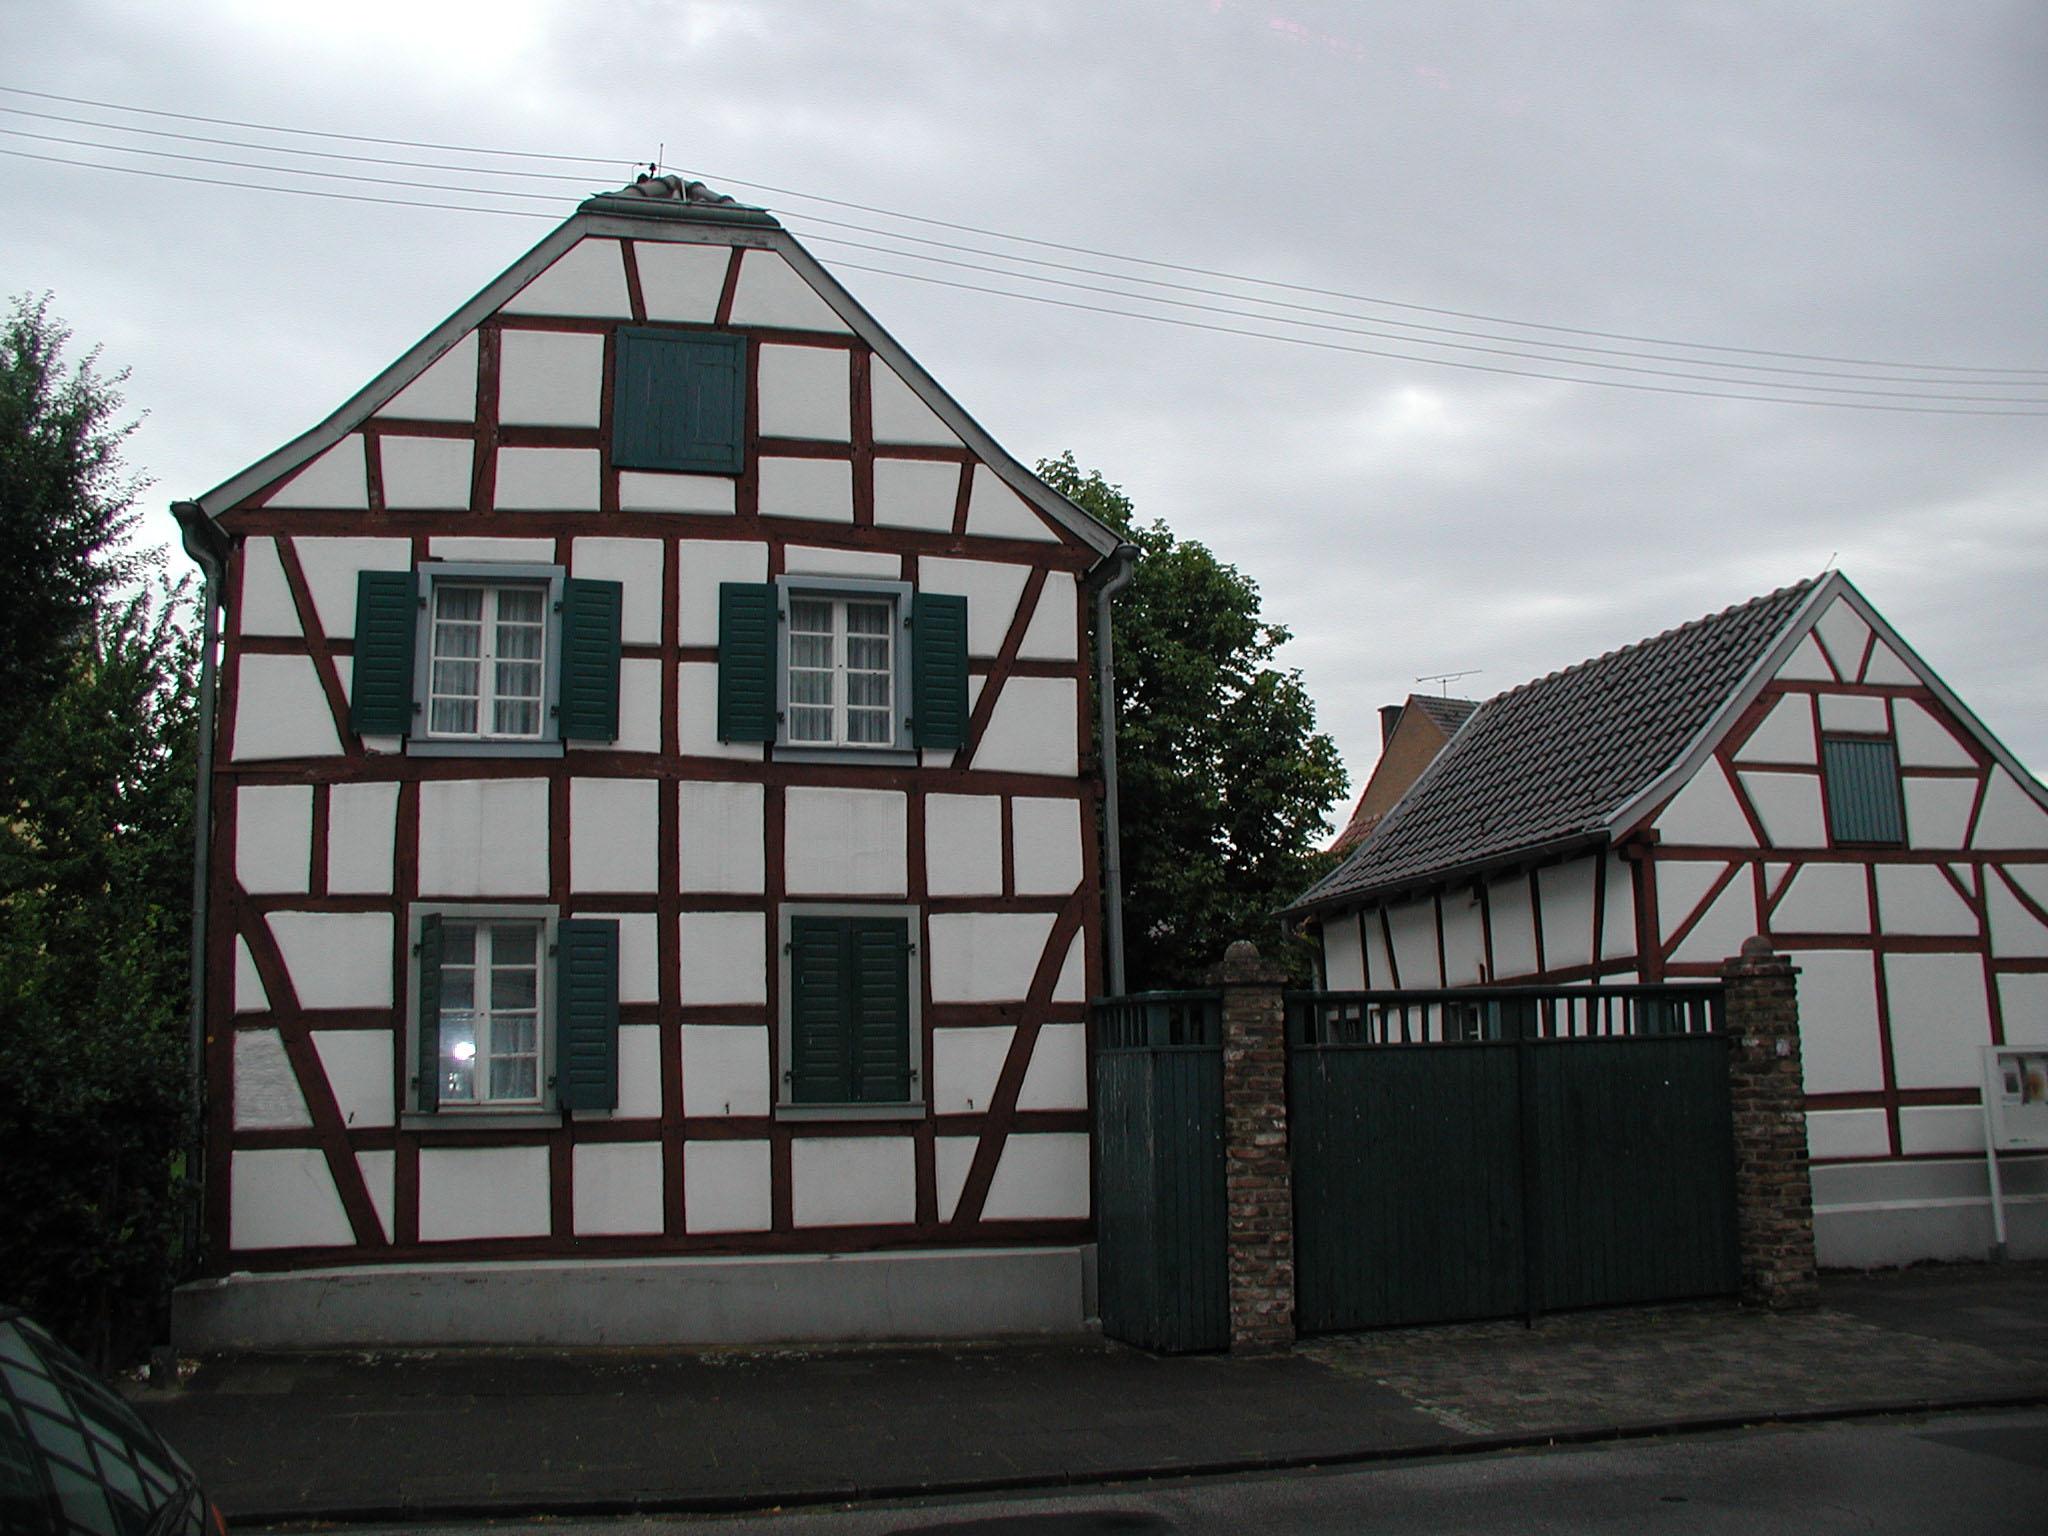 File:Alt-Hürth-Löhrerhof-020.jpg - Wikimedia Commons